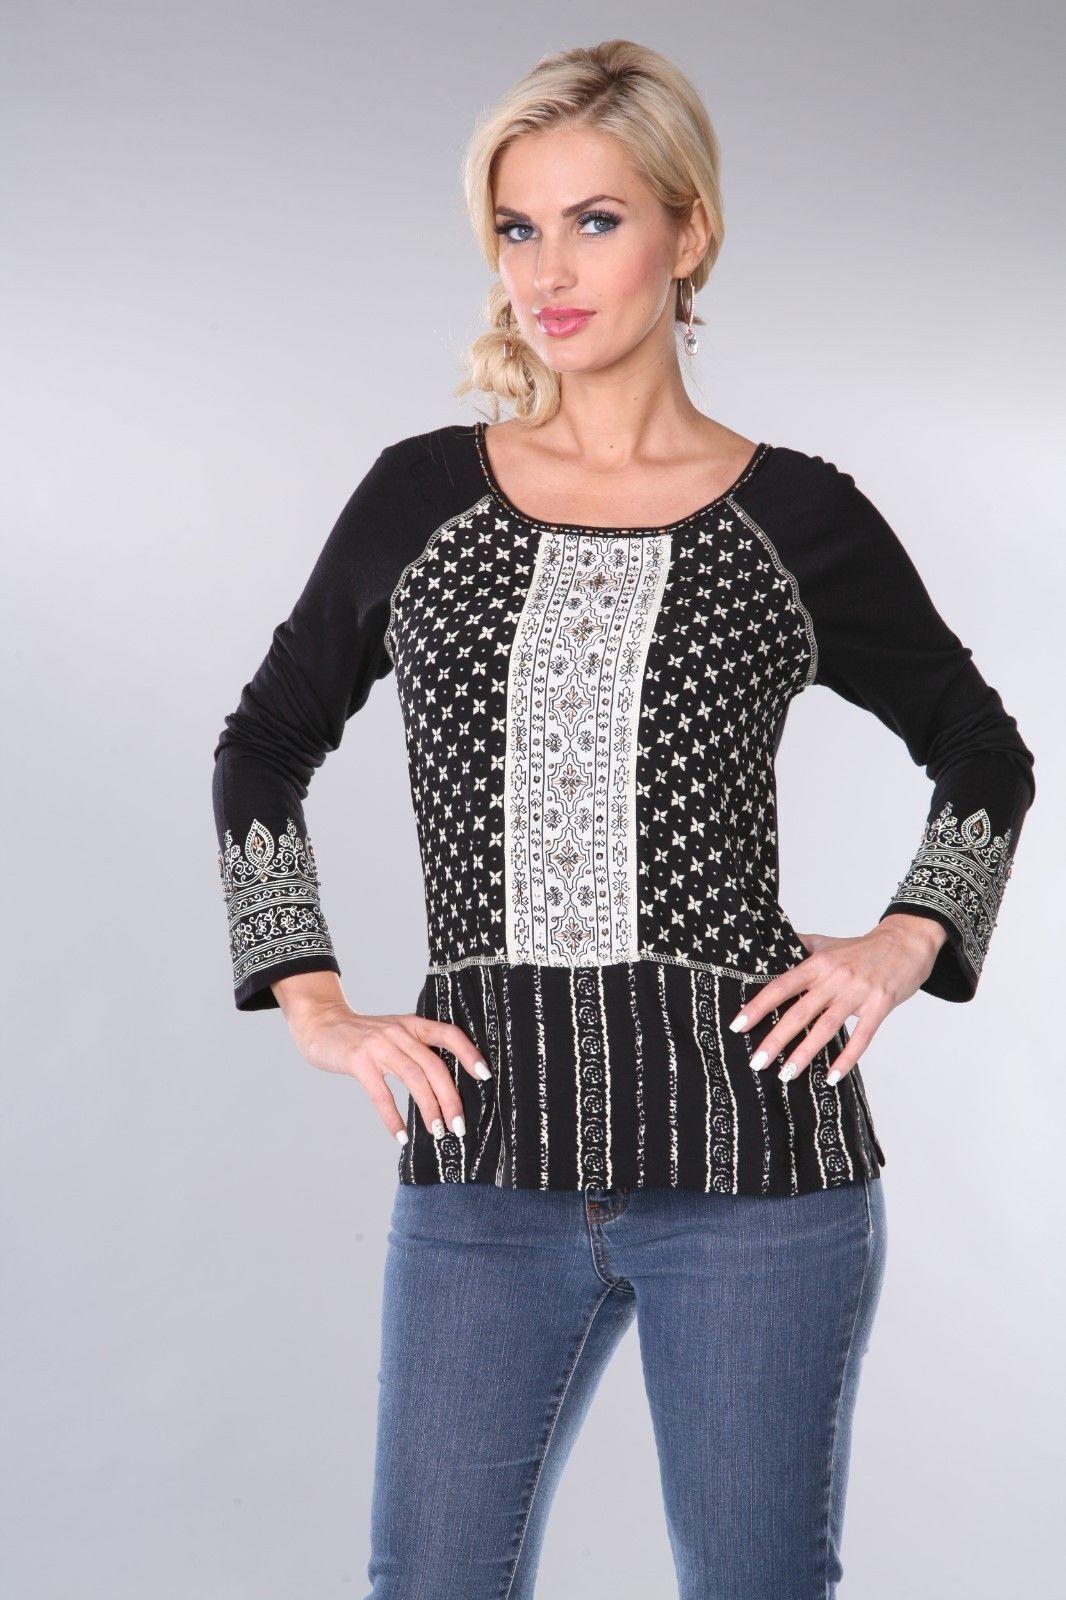 Woherren Blouse Top schwarz Cream Krista Lee Petra Group Embroiderot Beaded SMALL